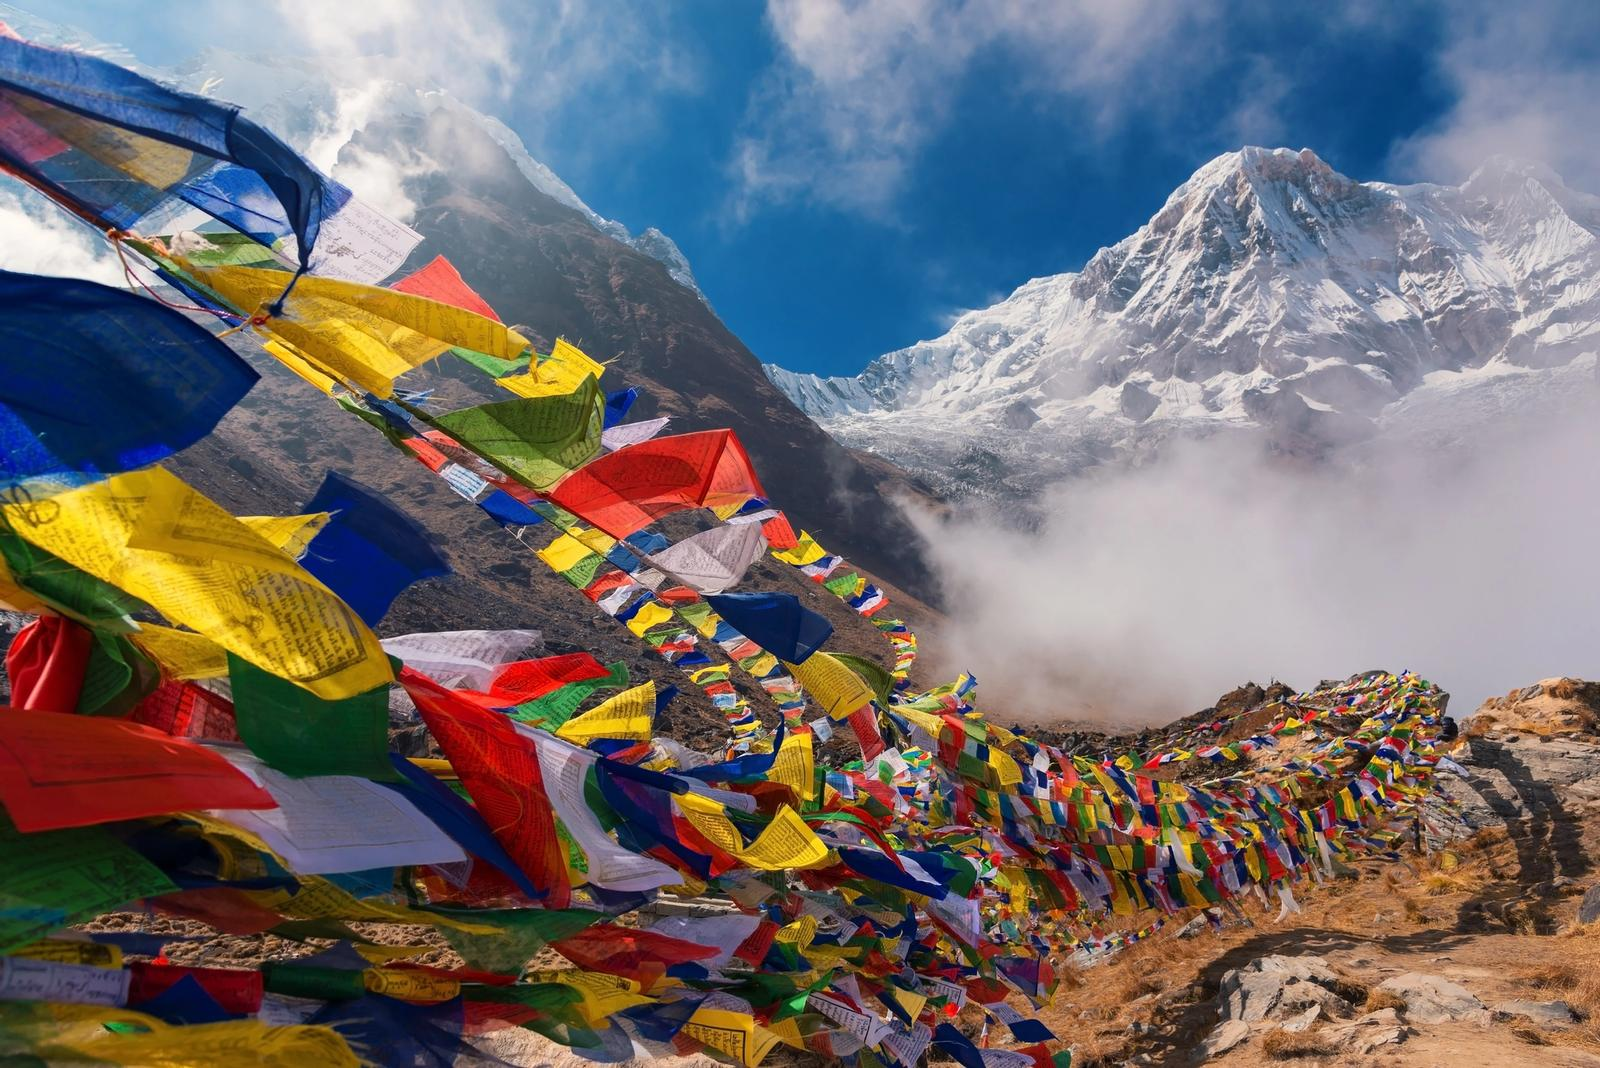 viaggi di gruppo organizzati in nepal